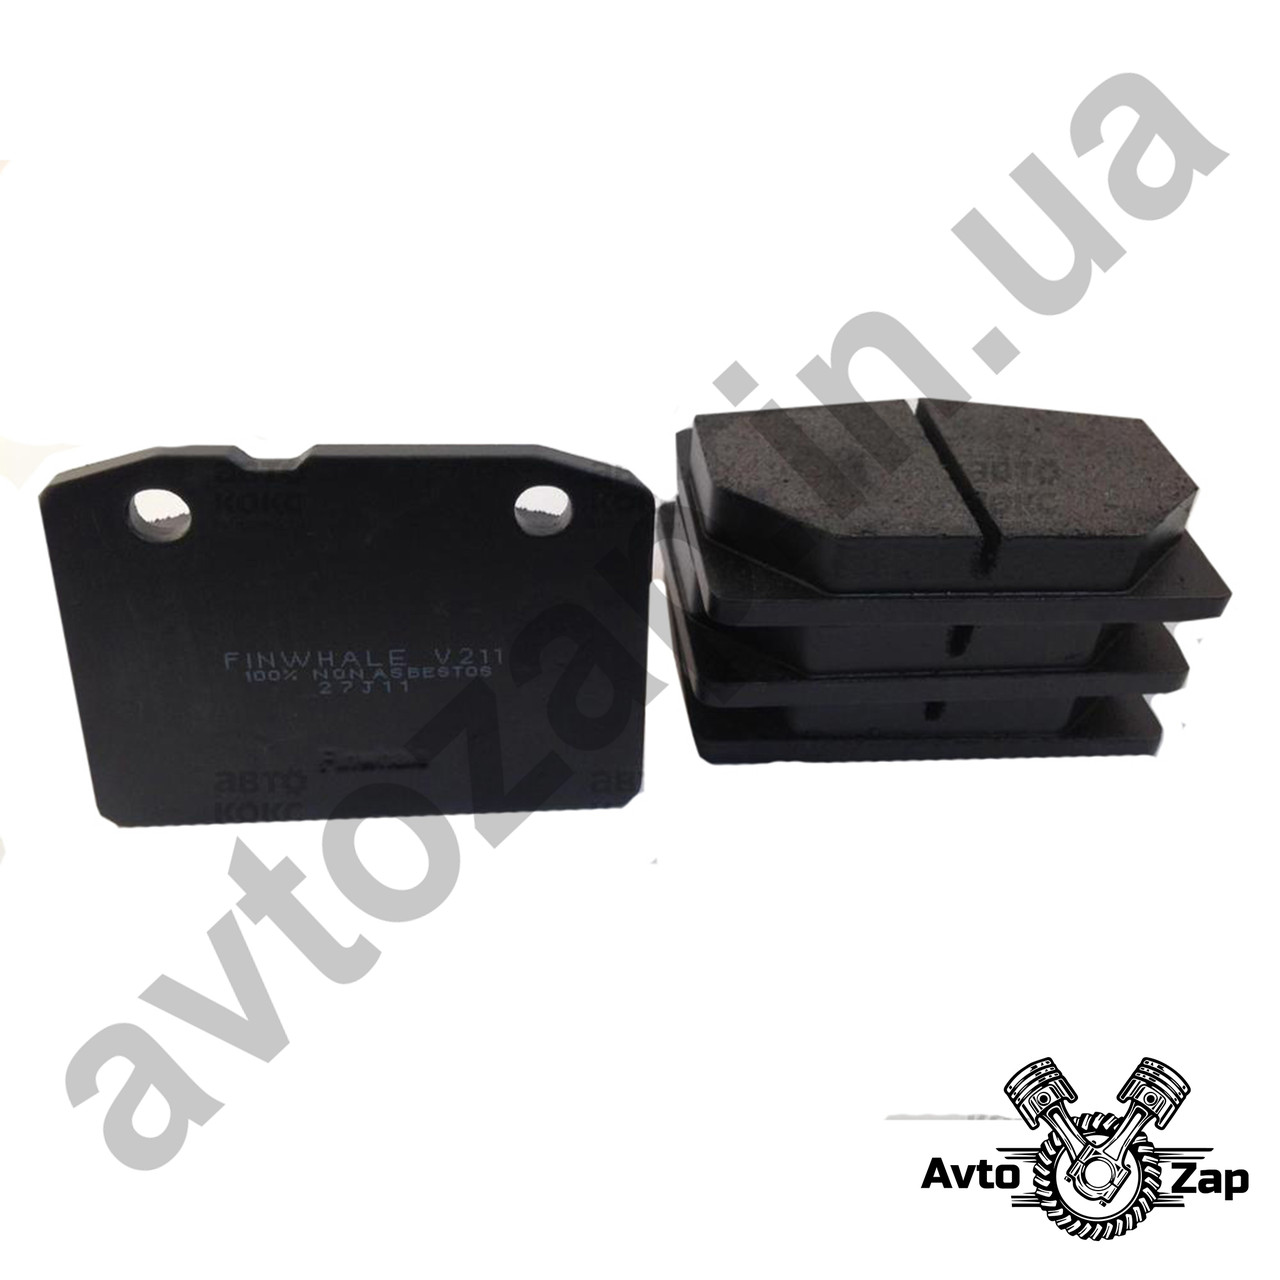 Колодка тормозная передняя ВАЗ 2108-099,2113-15  к-т  17018